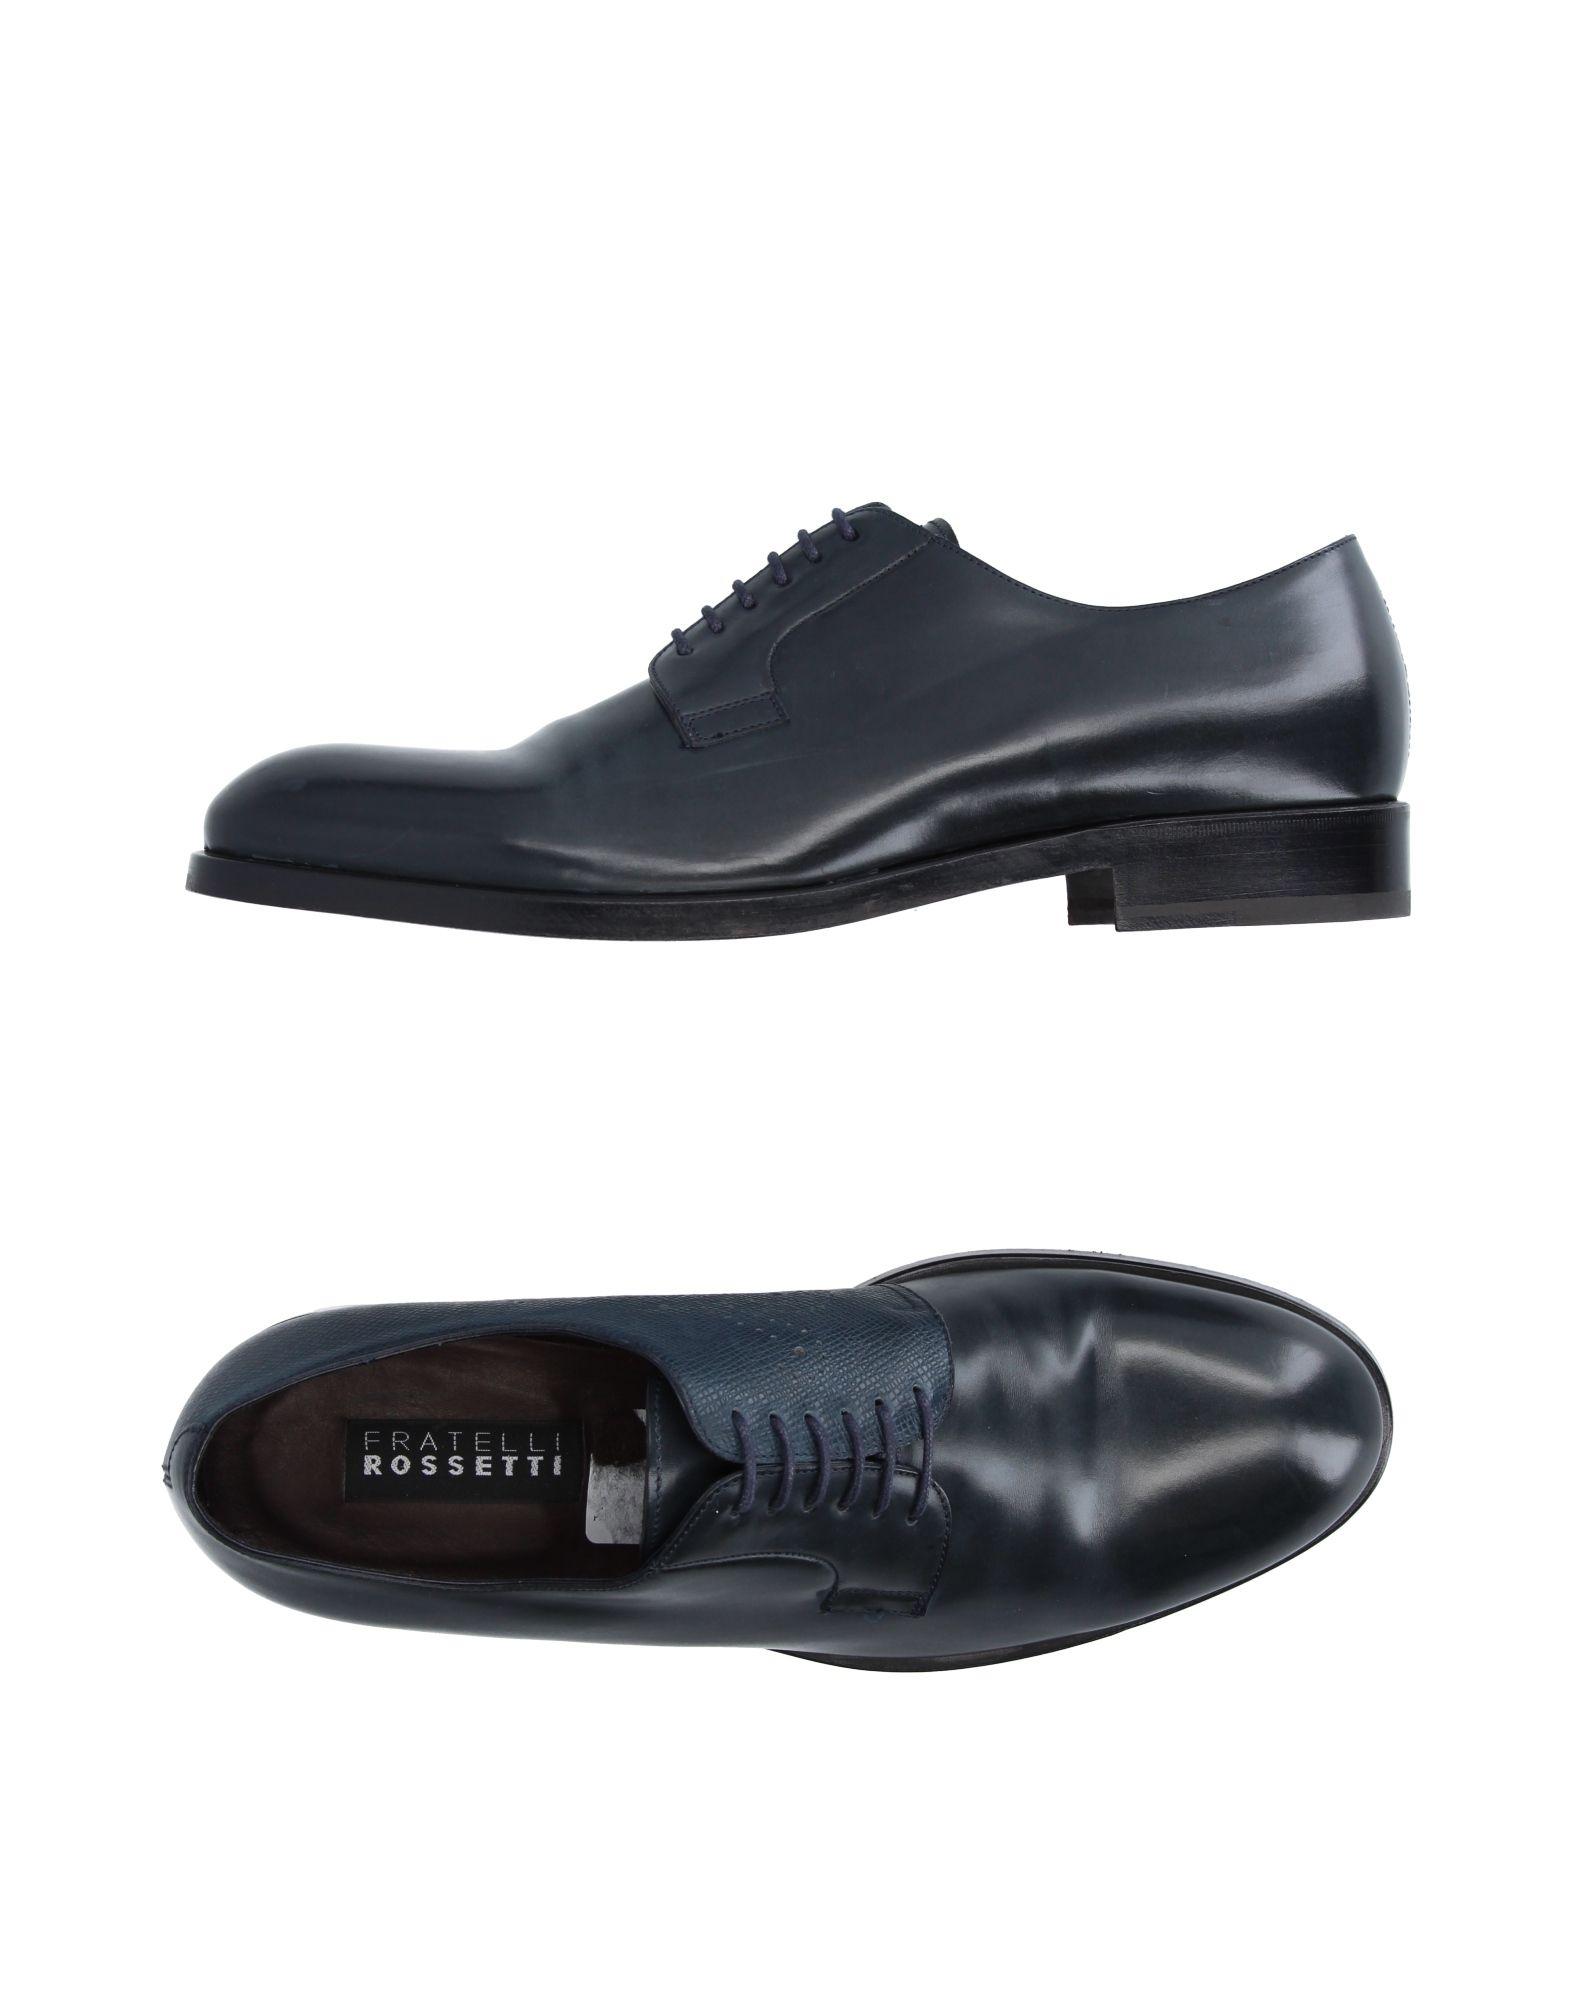 Fratelli 11217653LH Rossetti Schnürschuhe Herren  11217653LH Fratelli Gute Qualität beliebte Schuhe b9a3d0